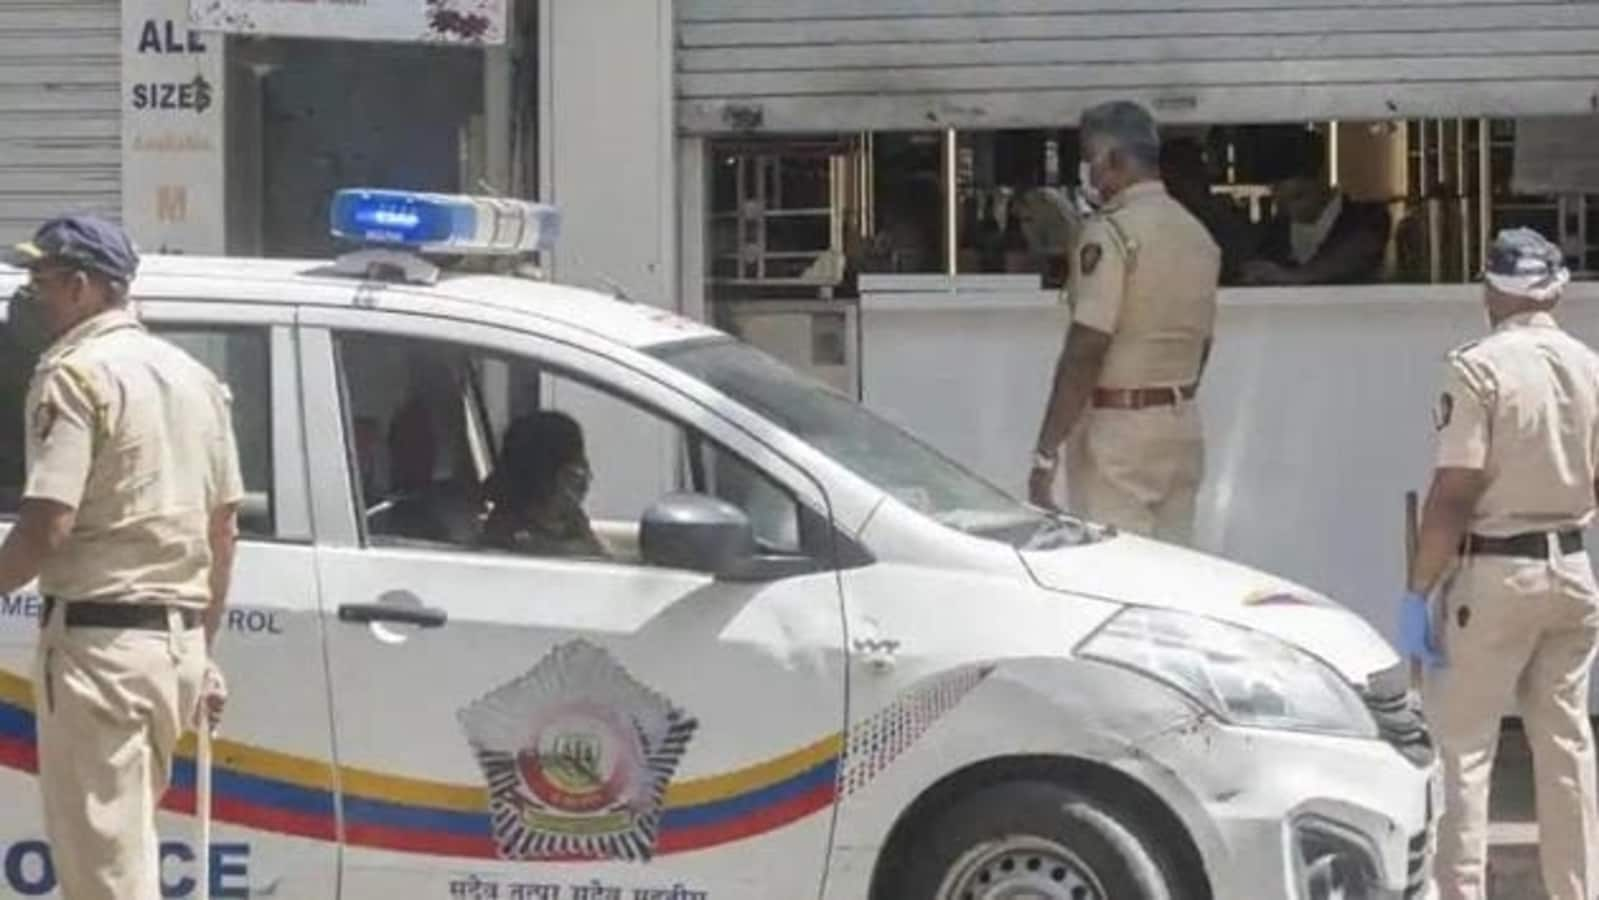 Extortion case: Mumbai Police looking for Dawood Ibrahim's aide Riyaz Bhati